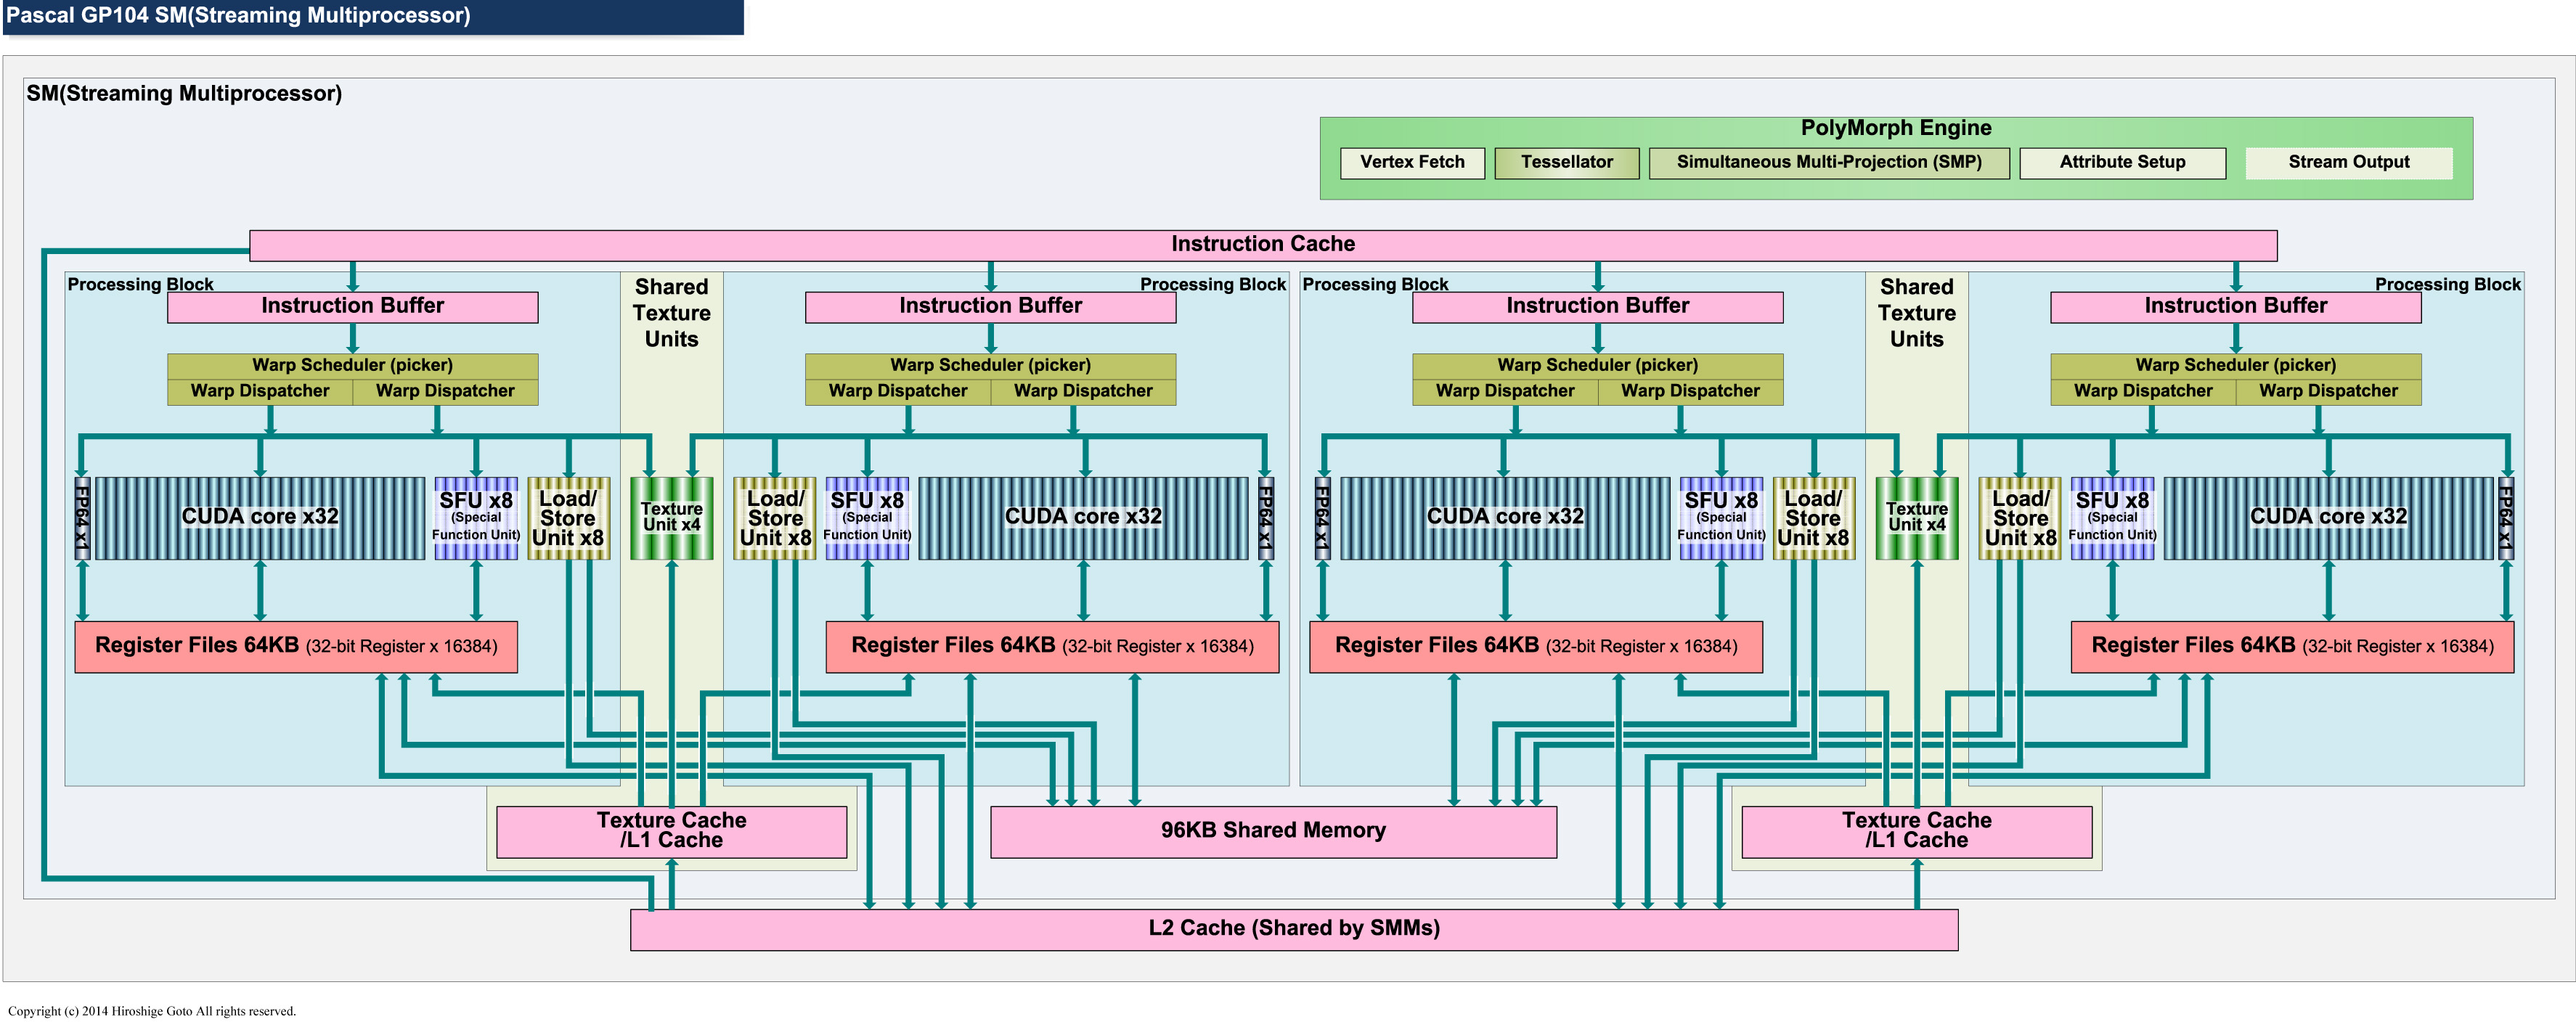 "GP104のSMブロック図<br class="""">PDF版は<span class=""img-inline raw""><a href=""/video/pcw/docs/757/916/p6.pdf"" ipw_status=""1"" ipw_linktype=""filelink_raw"" class=""resource"">こちら</a></span>"